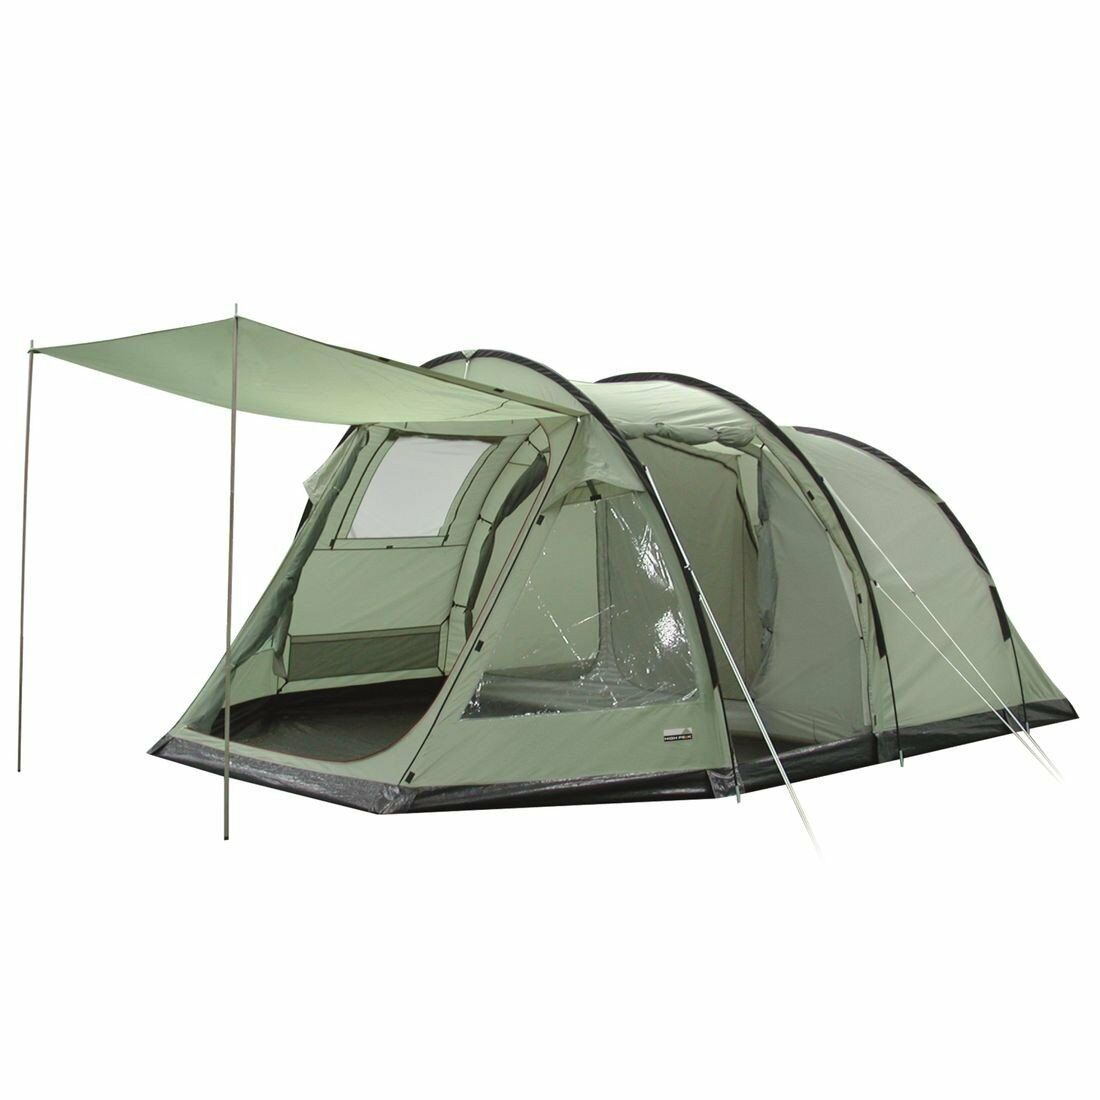 Campingzelt Zelt Igluzelt Kuppelzelt Familienzelt für 4 Personen